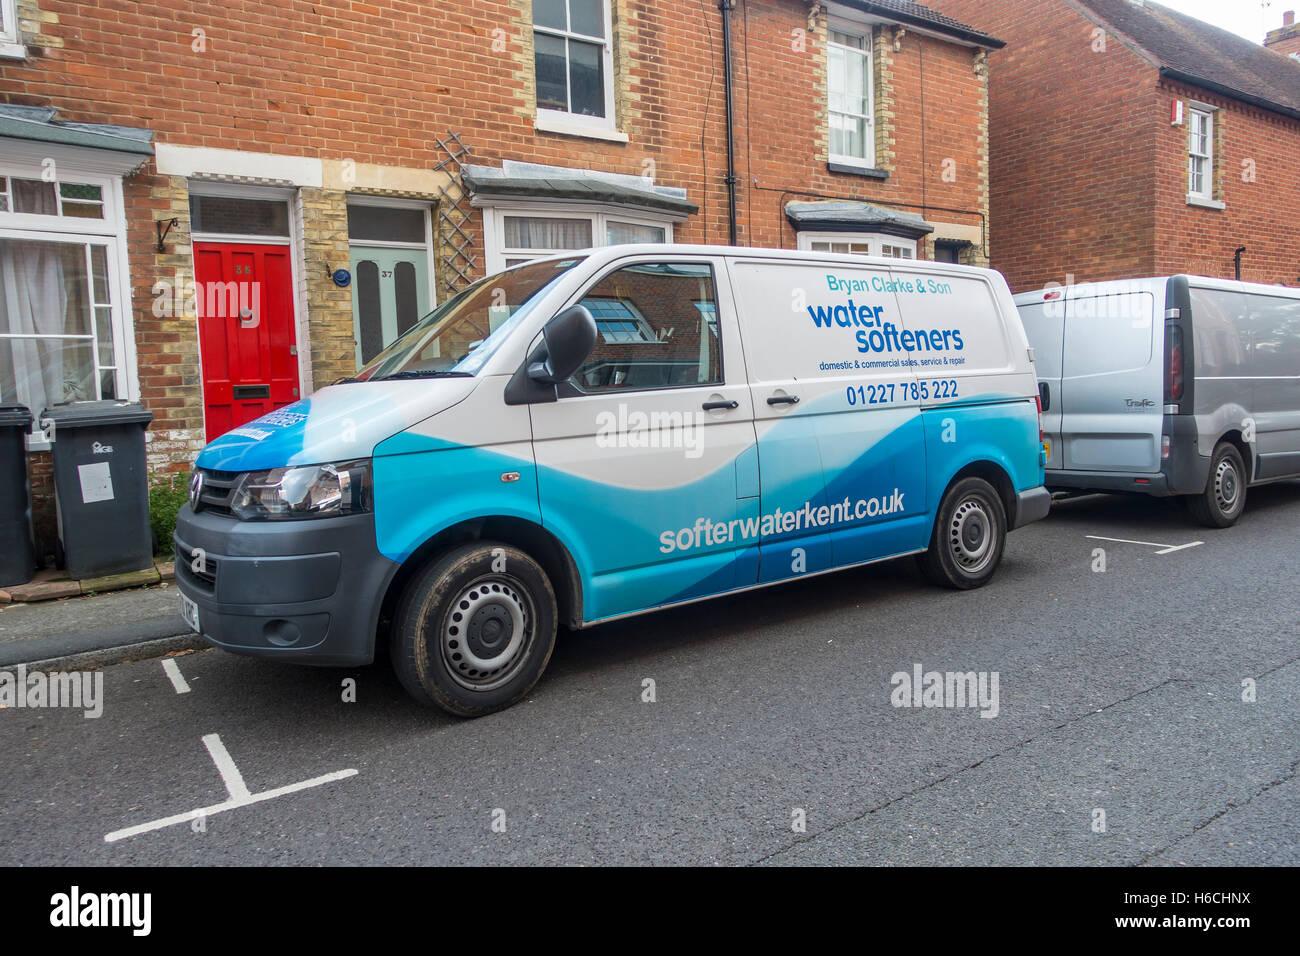 How To Repair A Water Softener Water Softener Installation Repair Company Van Bryan Clarke And